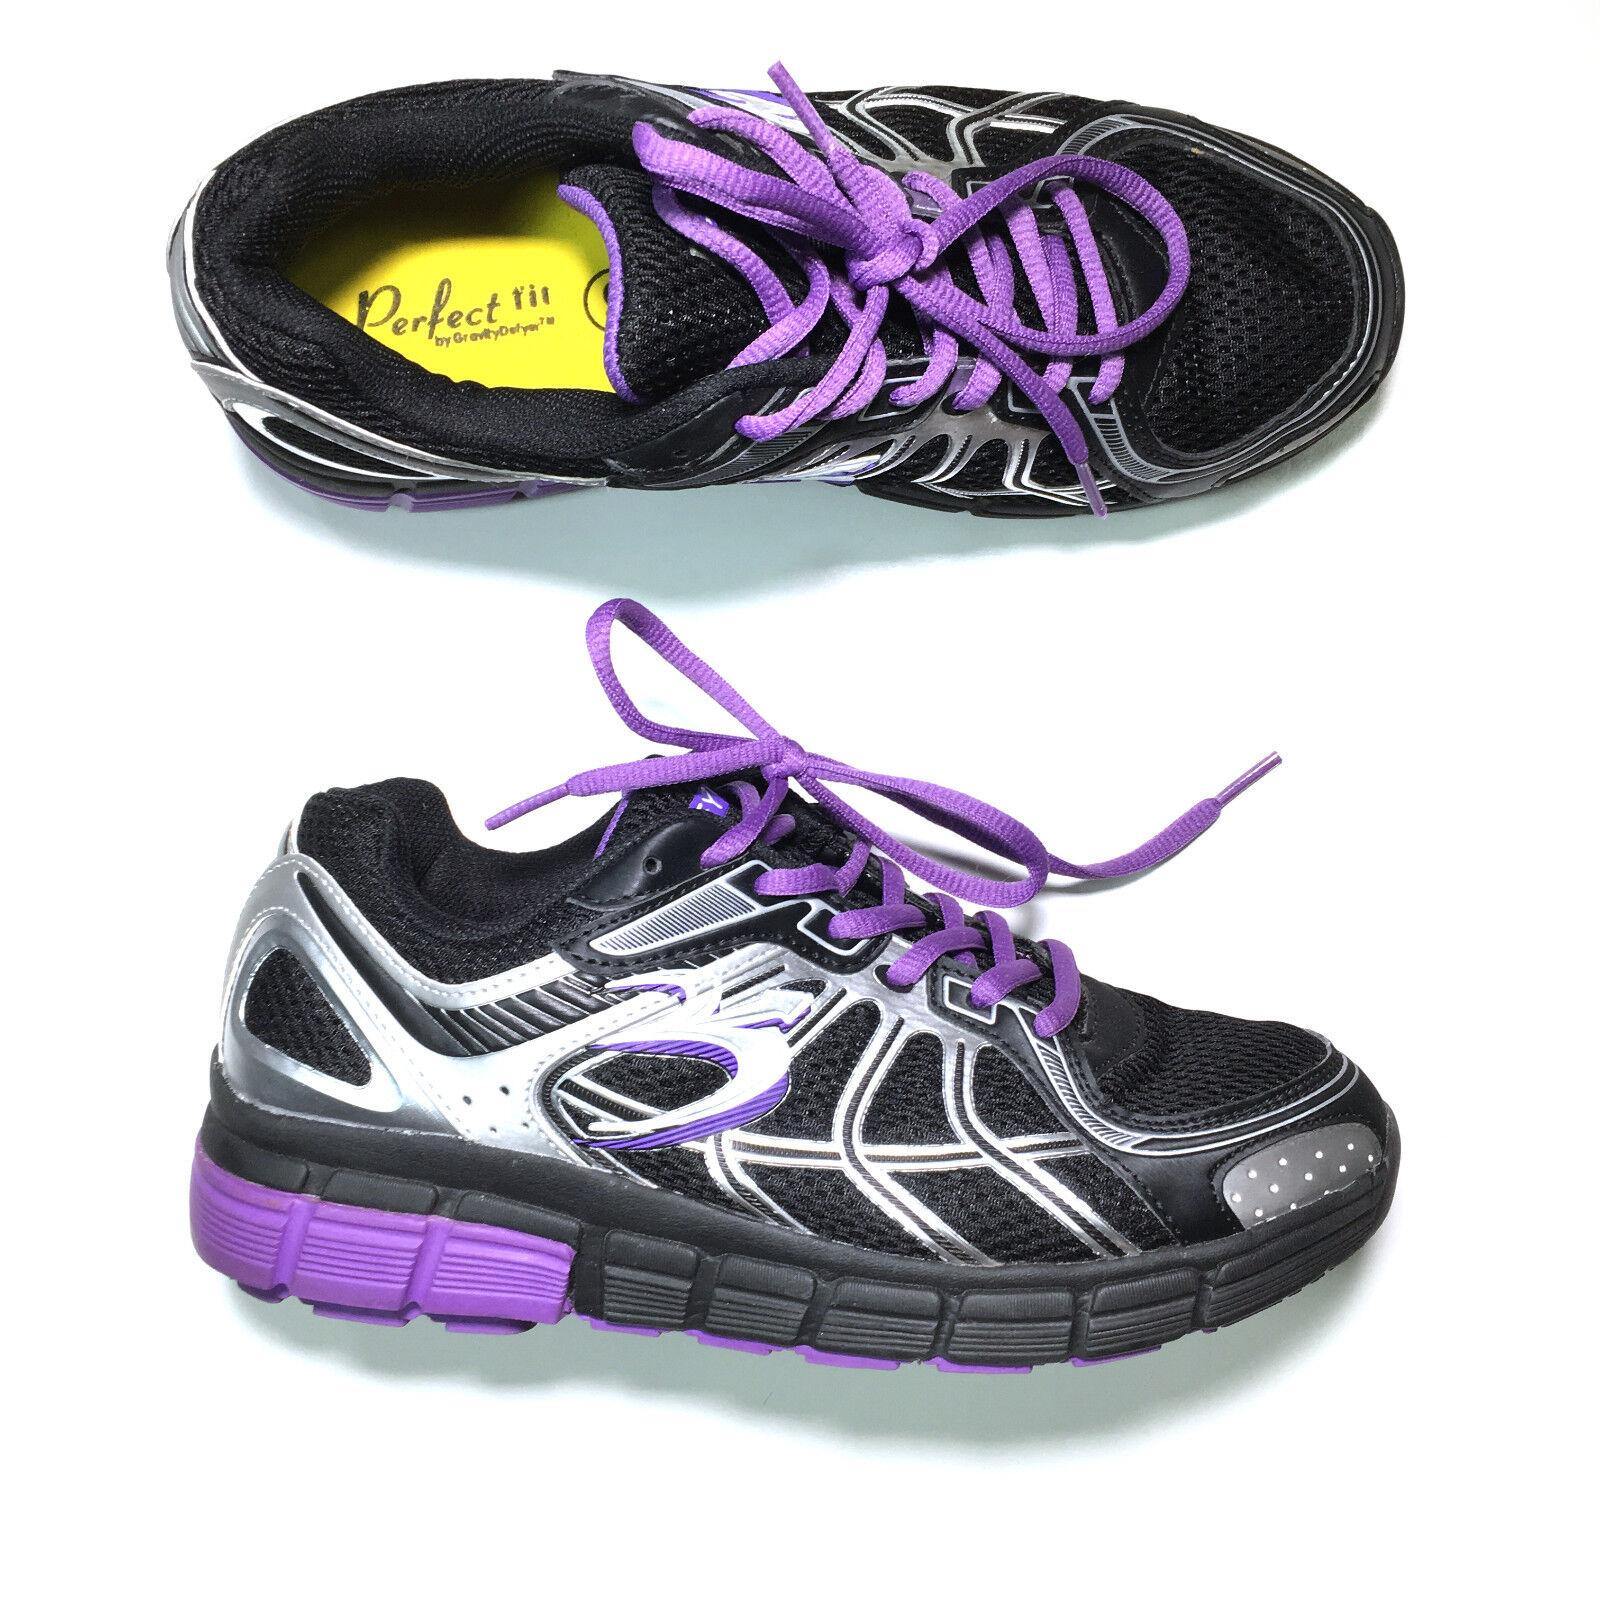 G-Defy  Chaussures  femmes  Sz 9 Super Walk Athletic Nursing Gravity Defyer  noir Violet